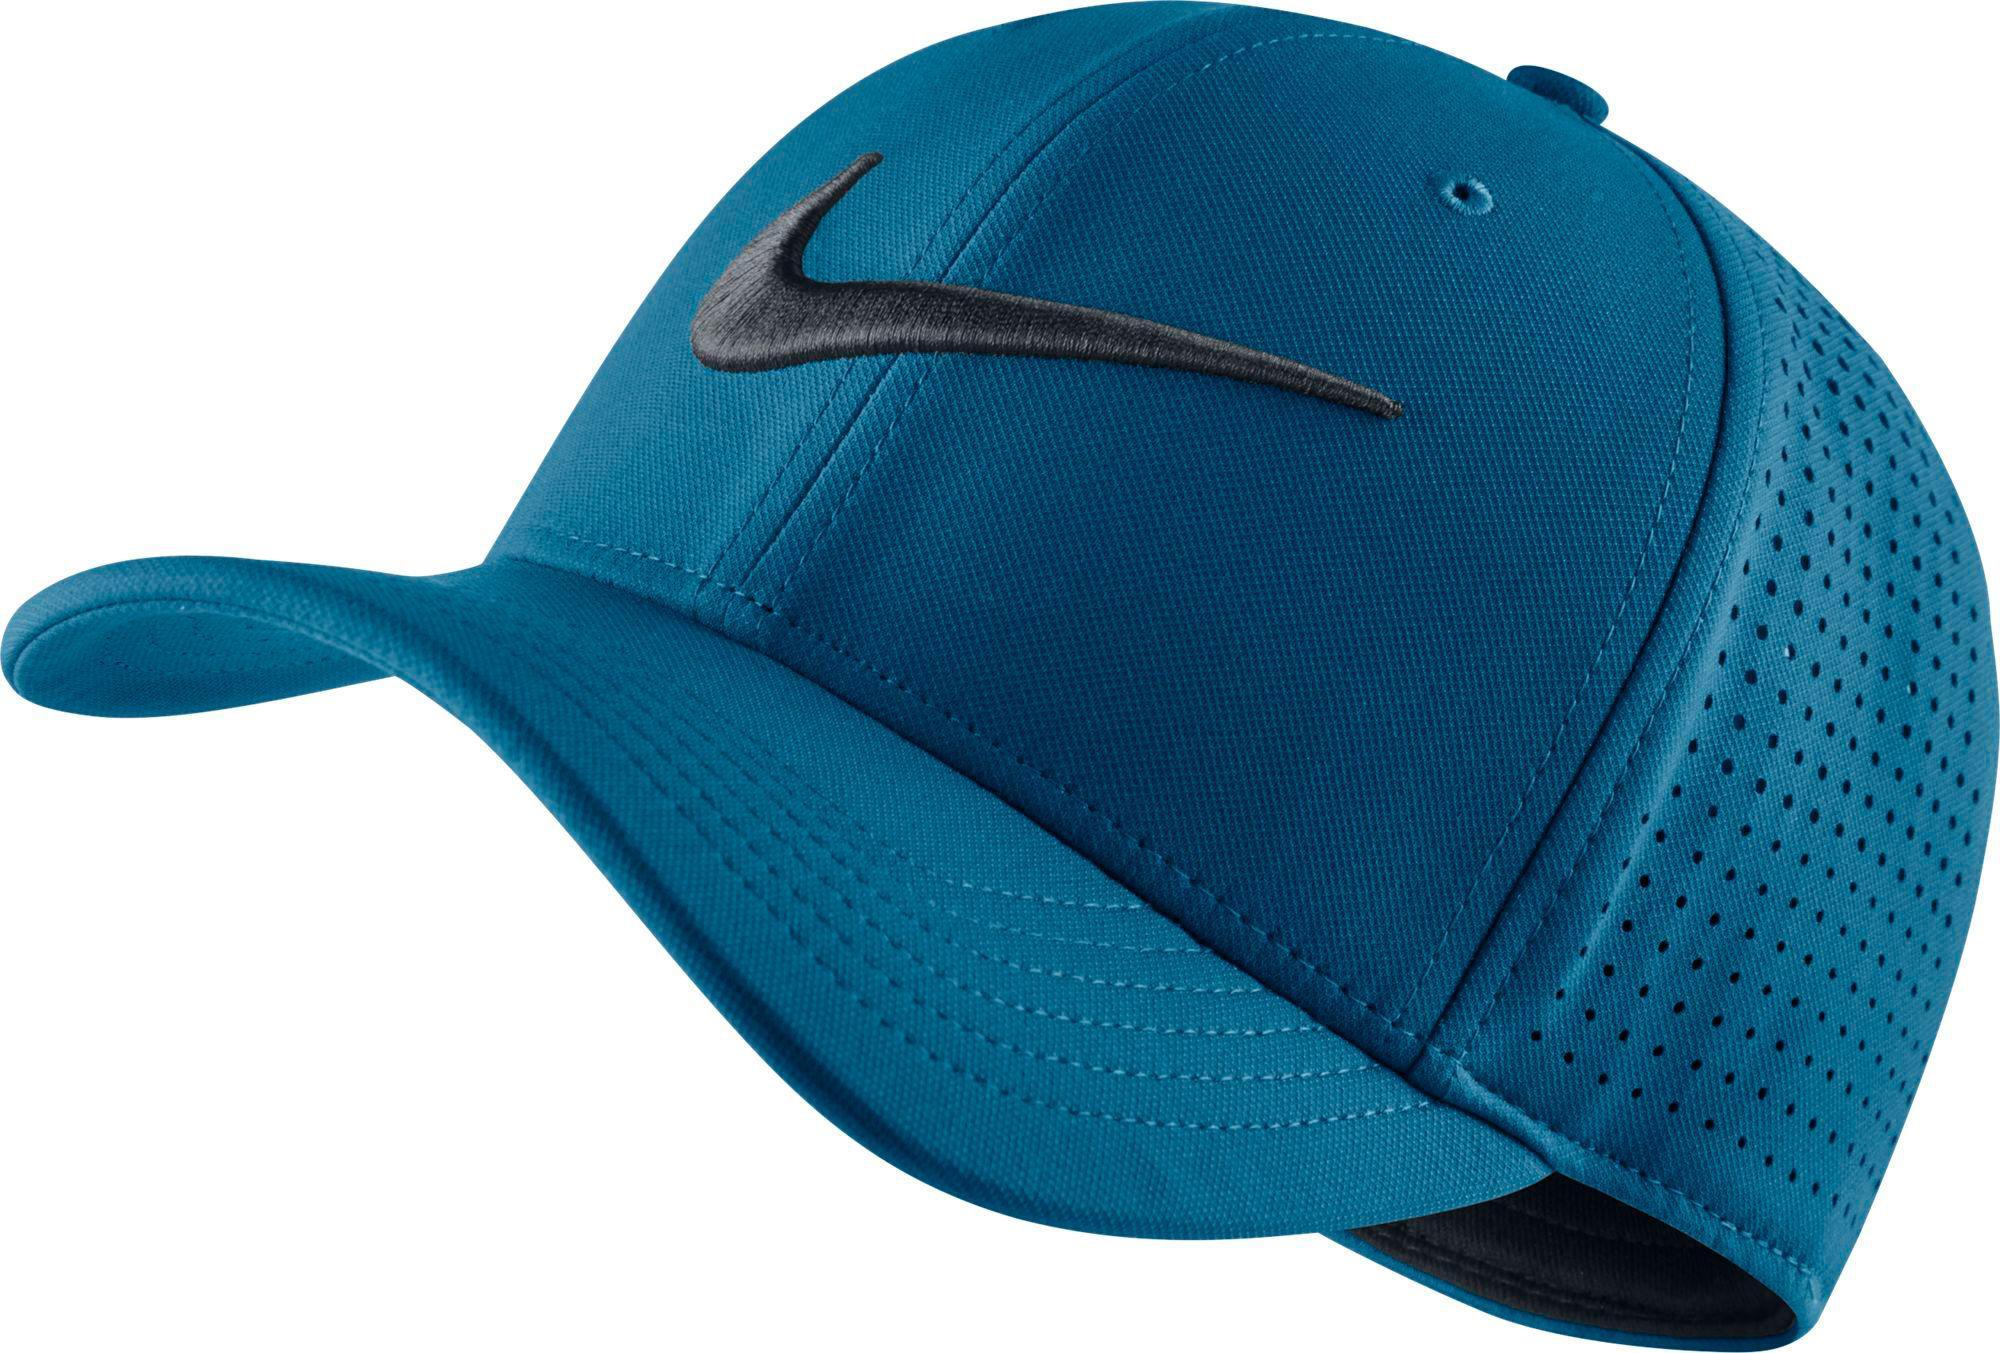 Lyst - Nike Train Vapor Classic99 Hat in Blue for Men 58a33f3345d